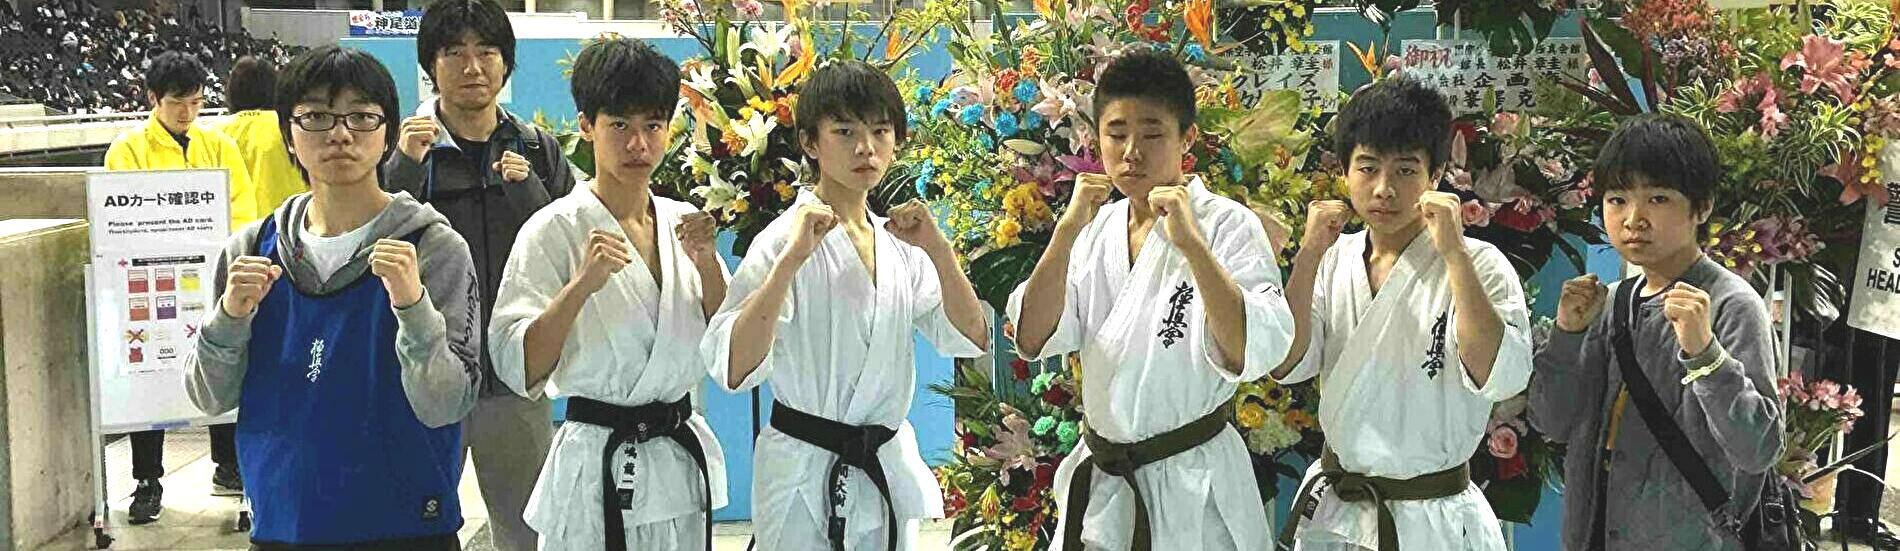 https://kyokushin-jonan-osaki.com/